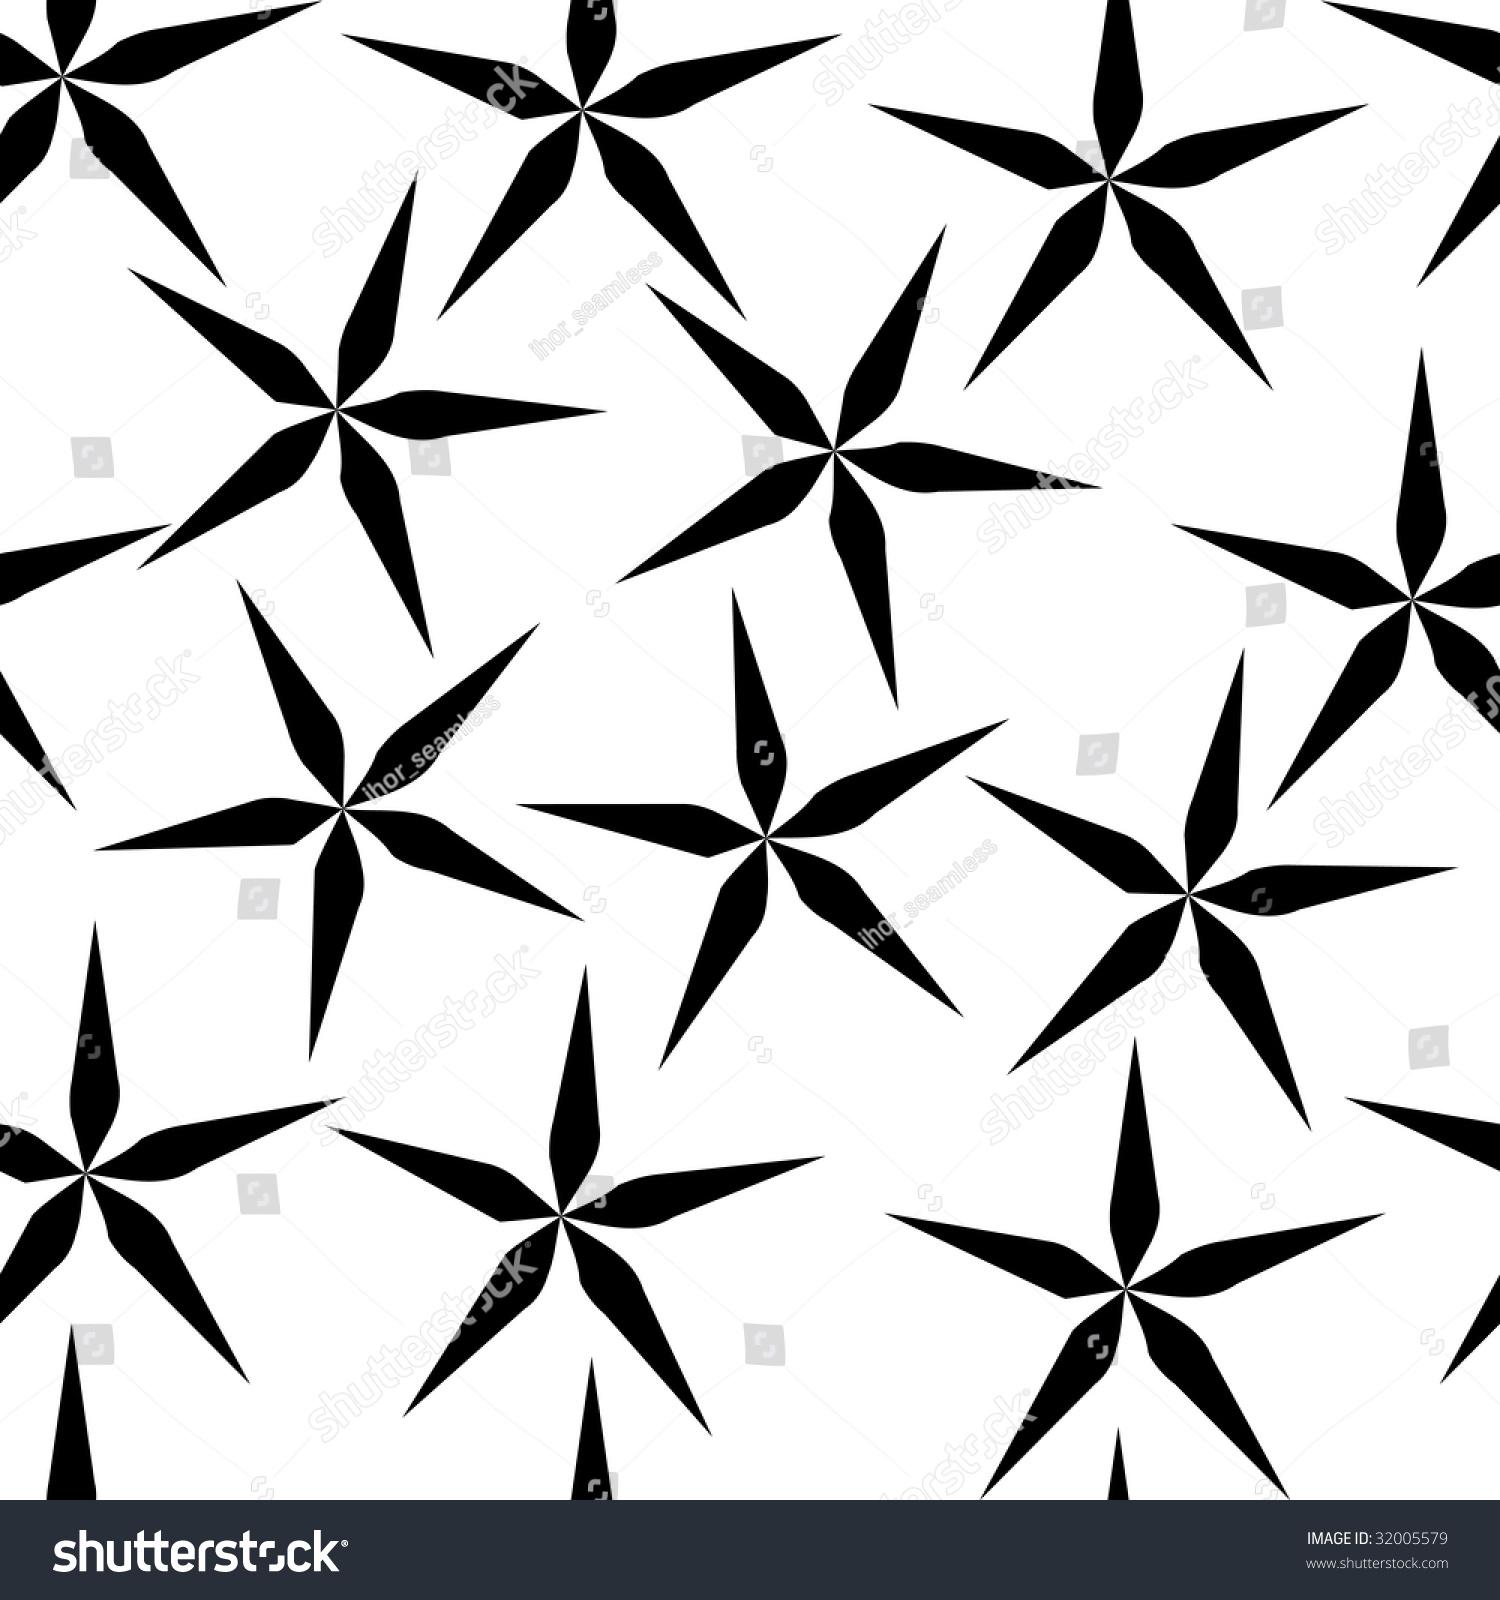 Seamless Simple Black White Repeating Flower Stock Illustration